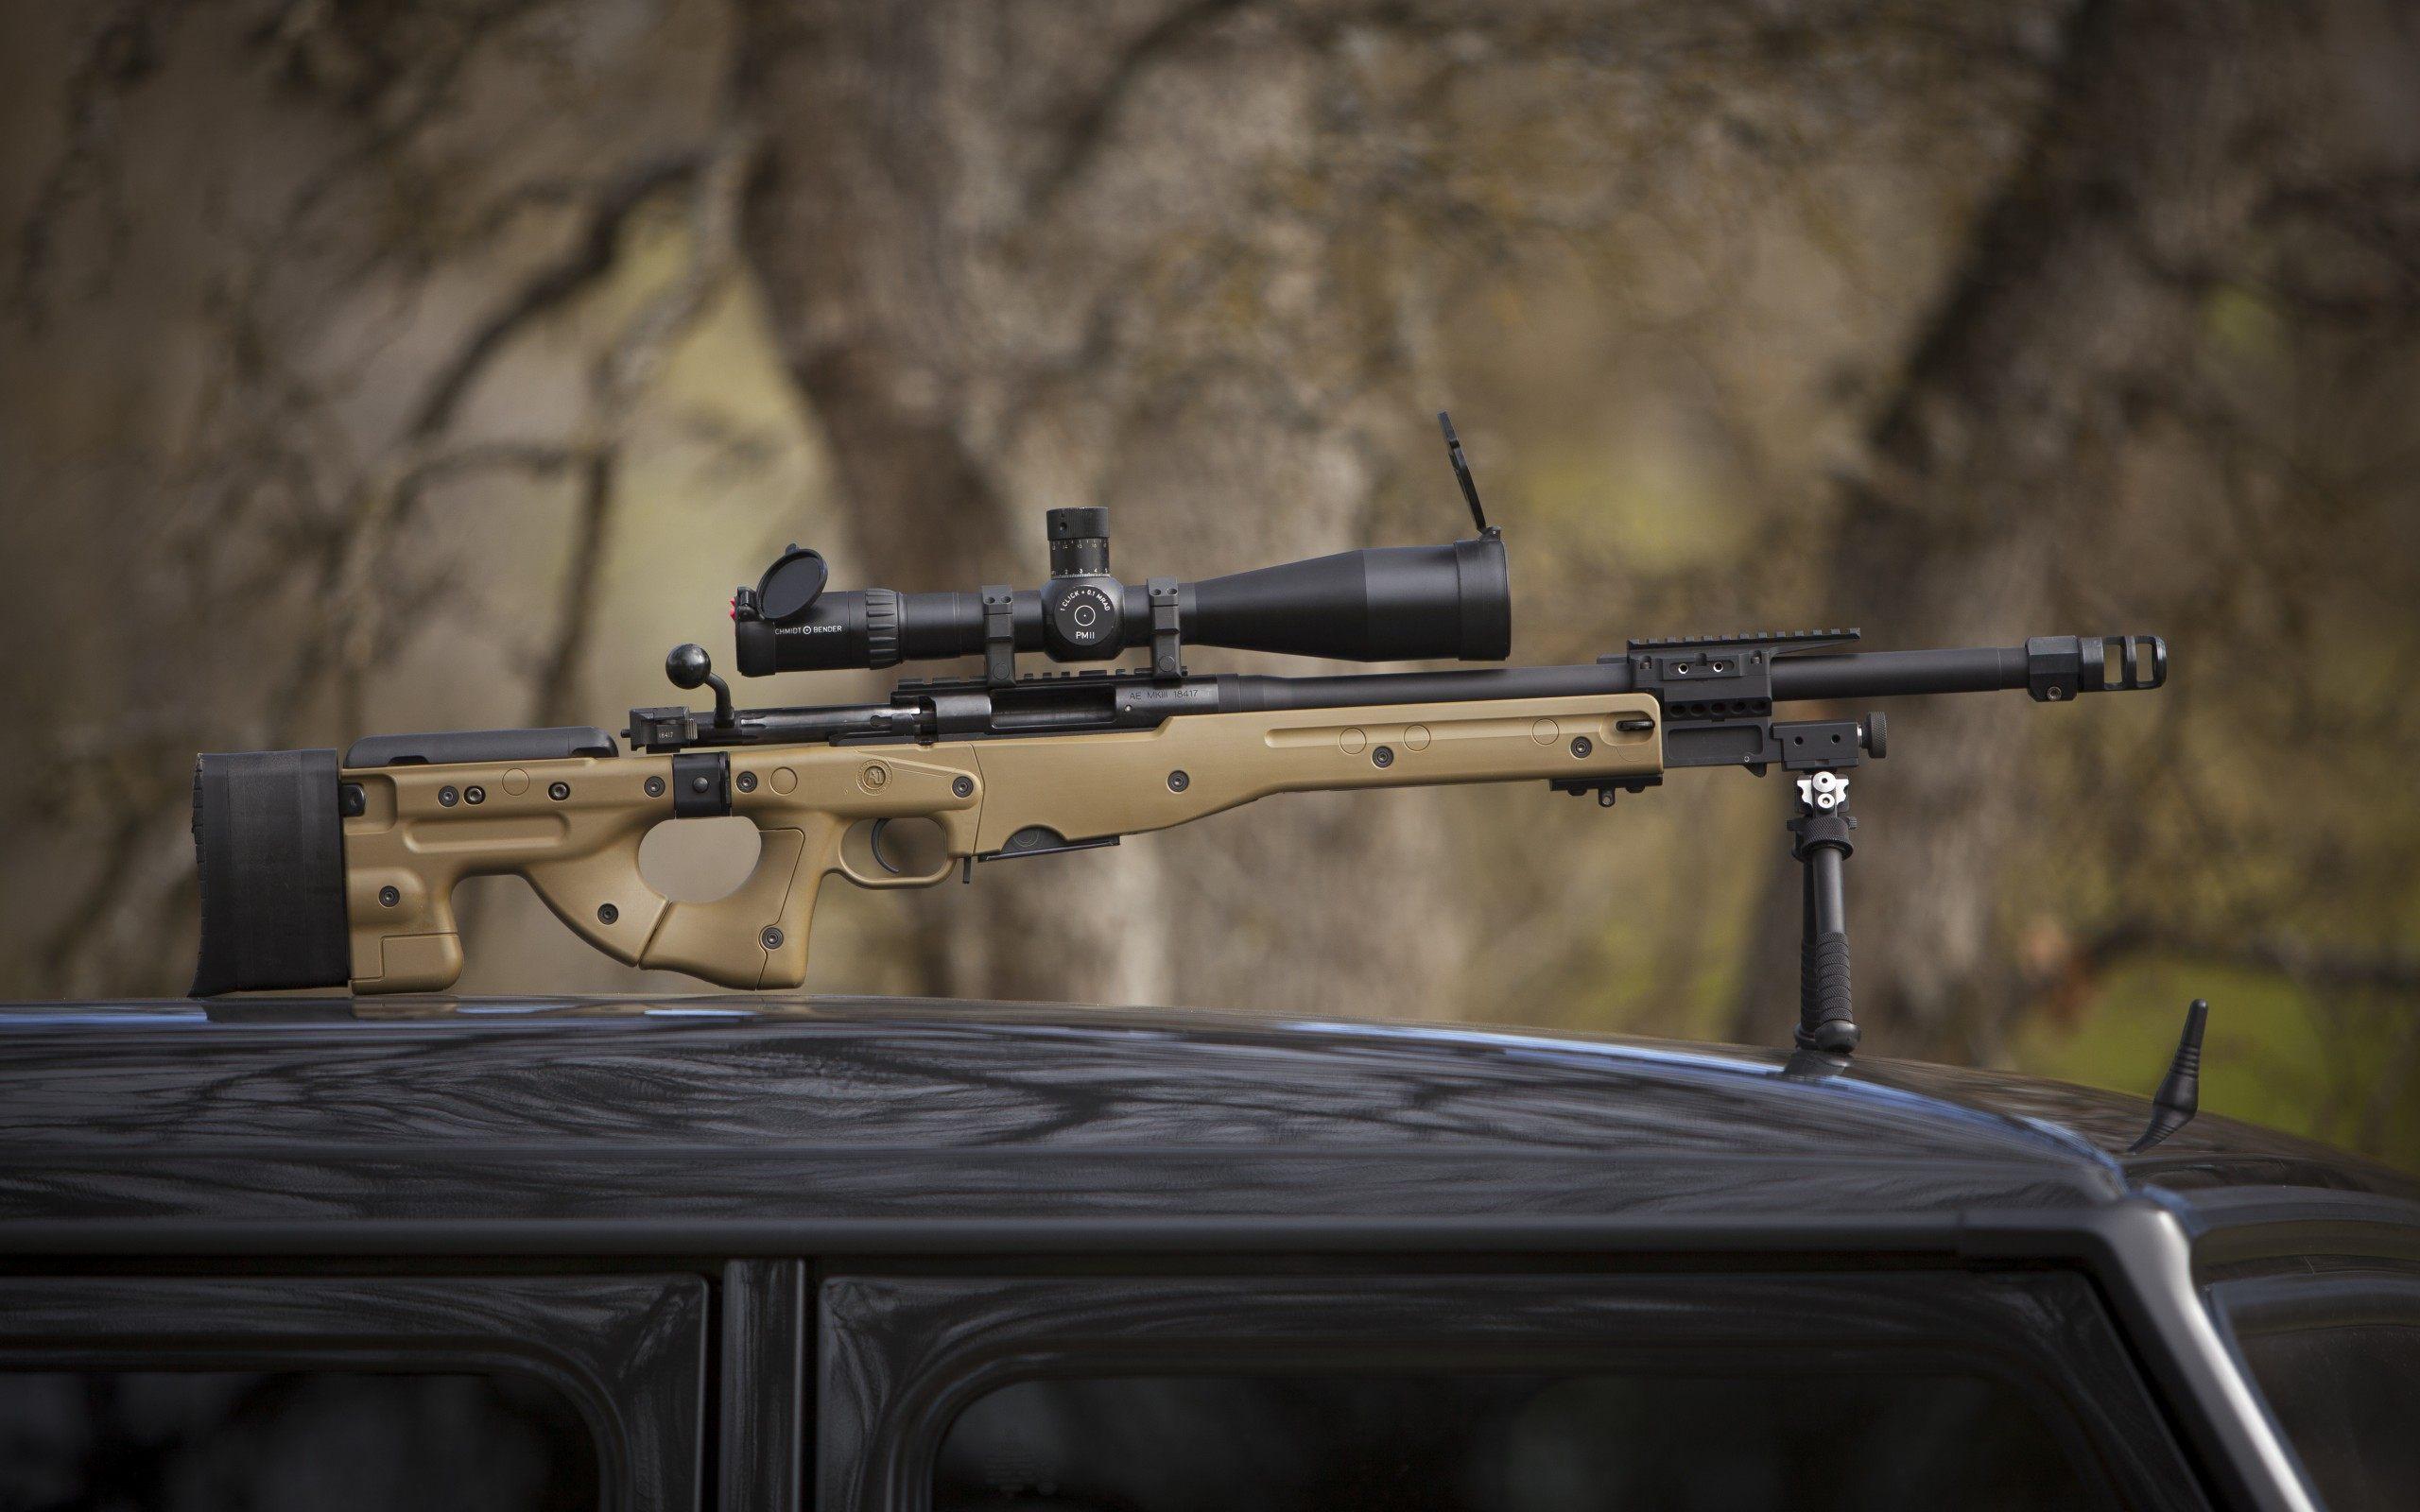 Dragunov Sniper Rifle Wallpaper Hd